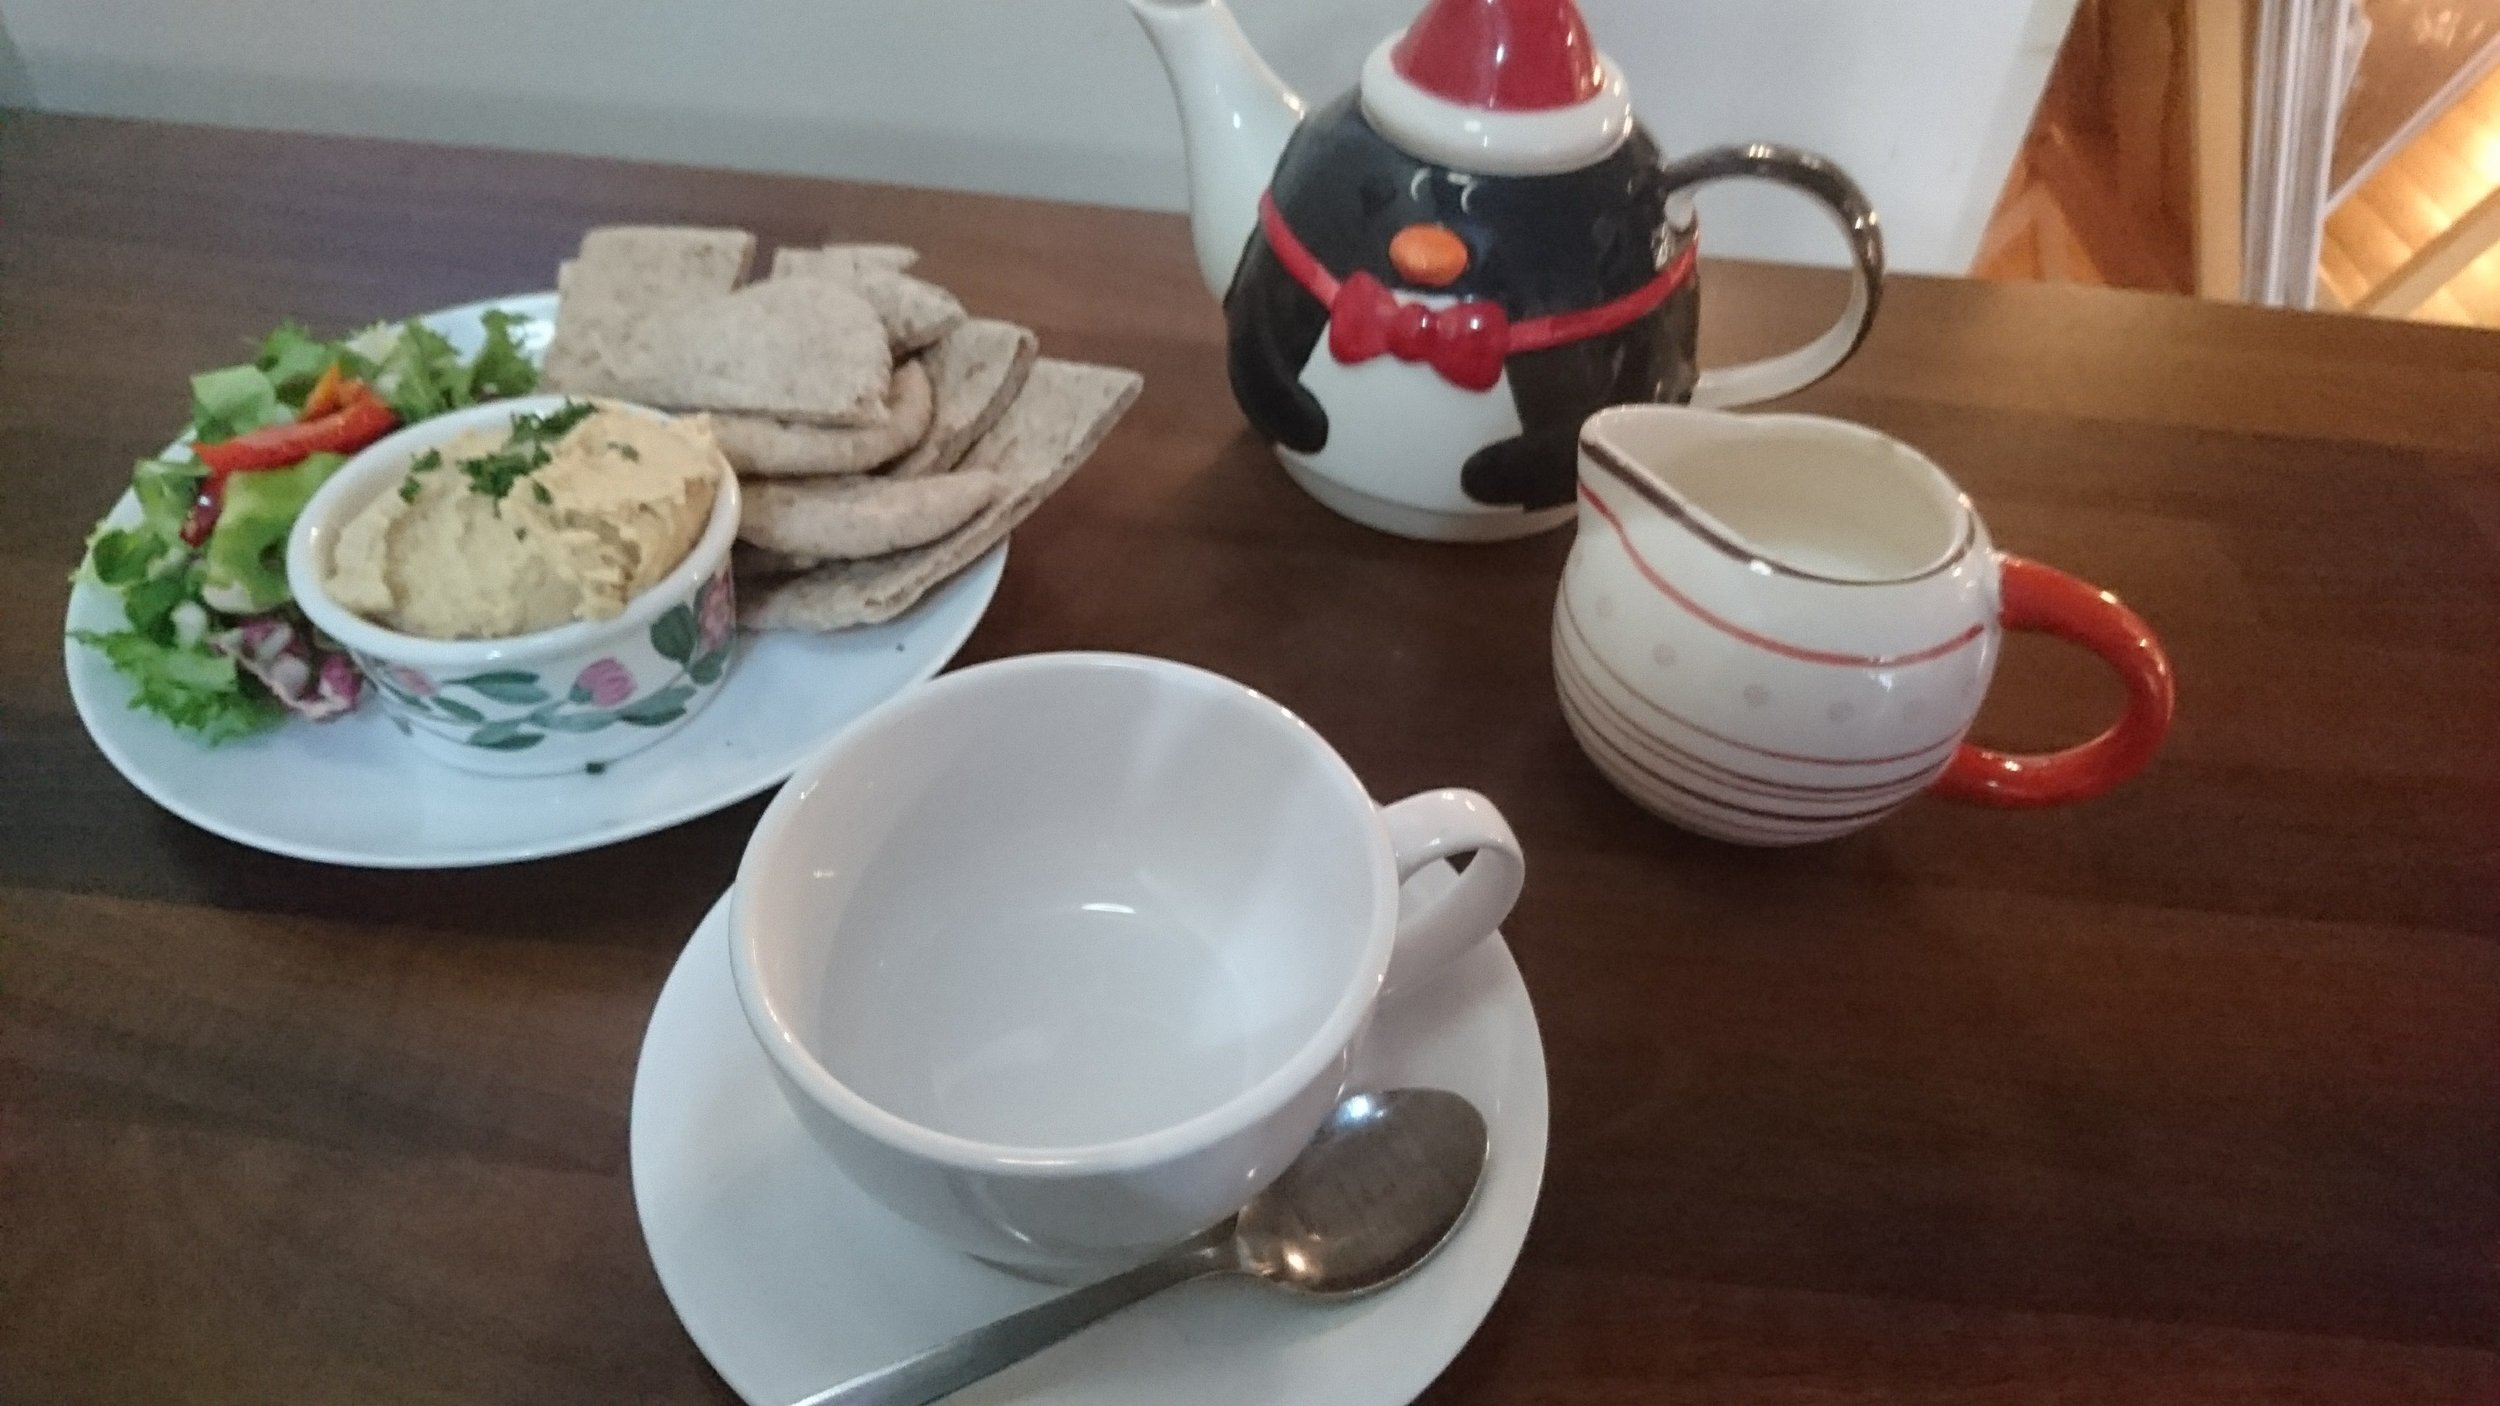 Hummus, Flatbreads and Tea at Madigan's Food Emporium, Dundee / Jenny Eve